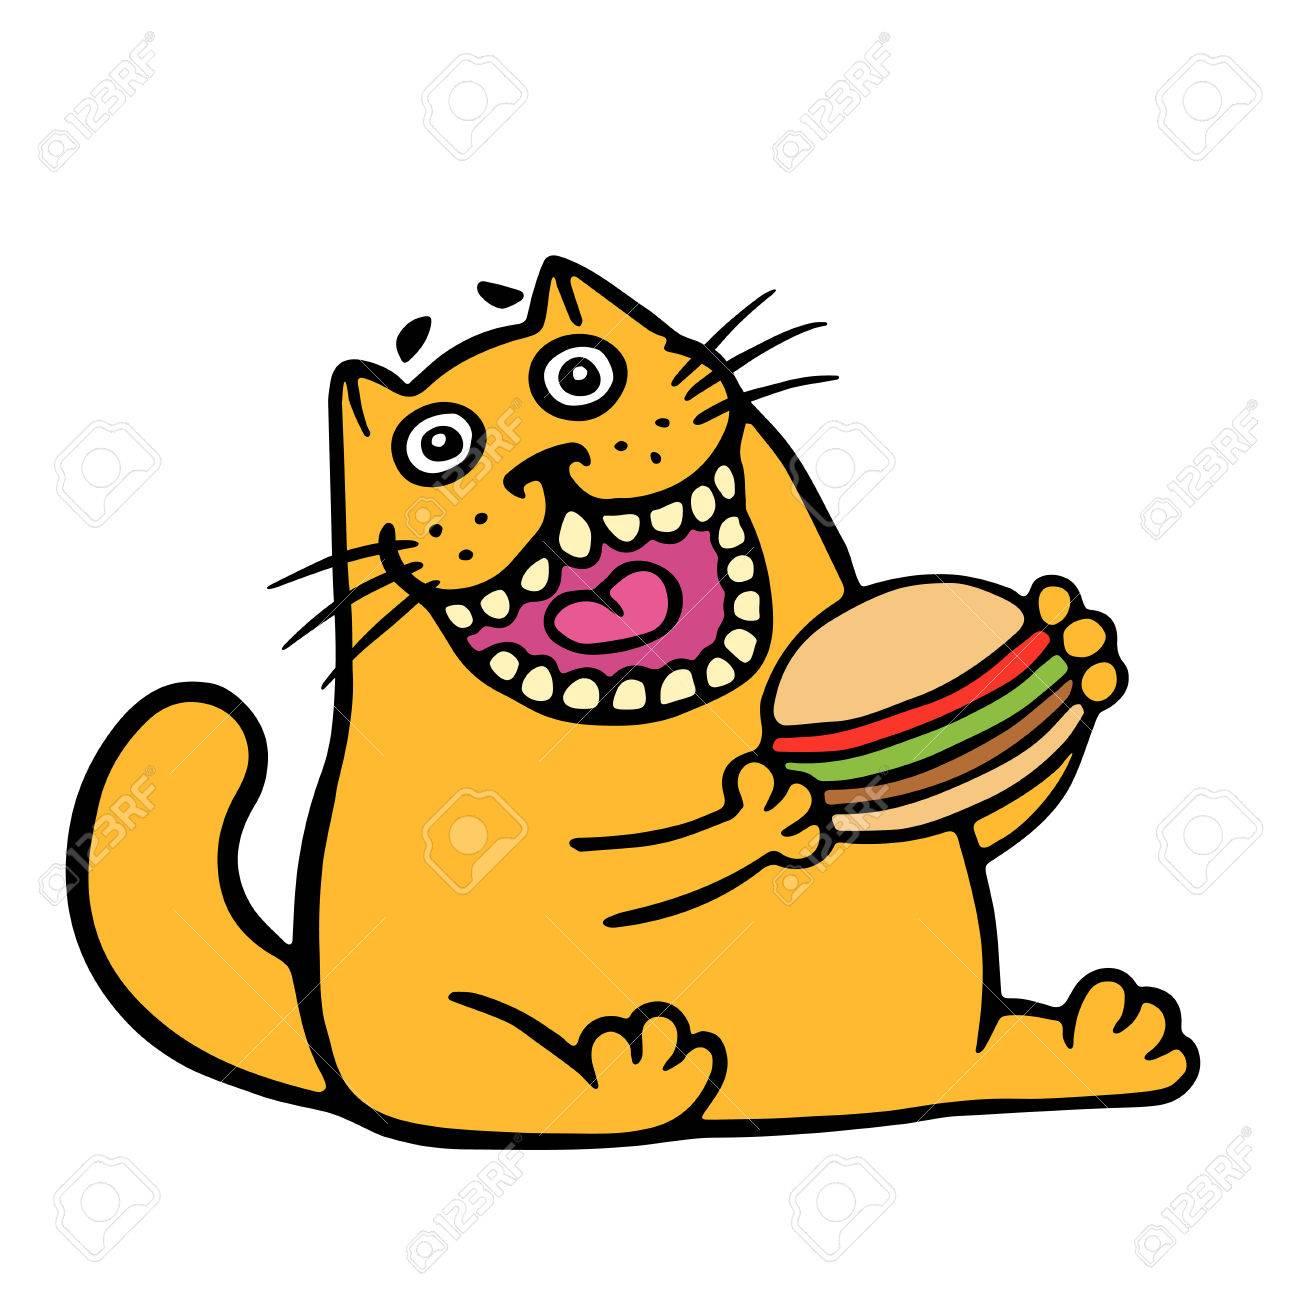 1300x1300 Cartoon Orange Cat Is Eating A Hamburger. Funny Cool Character